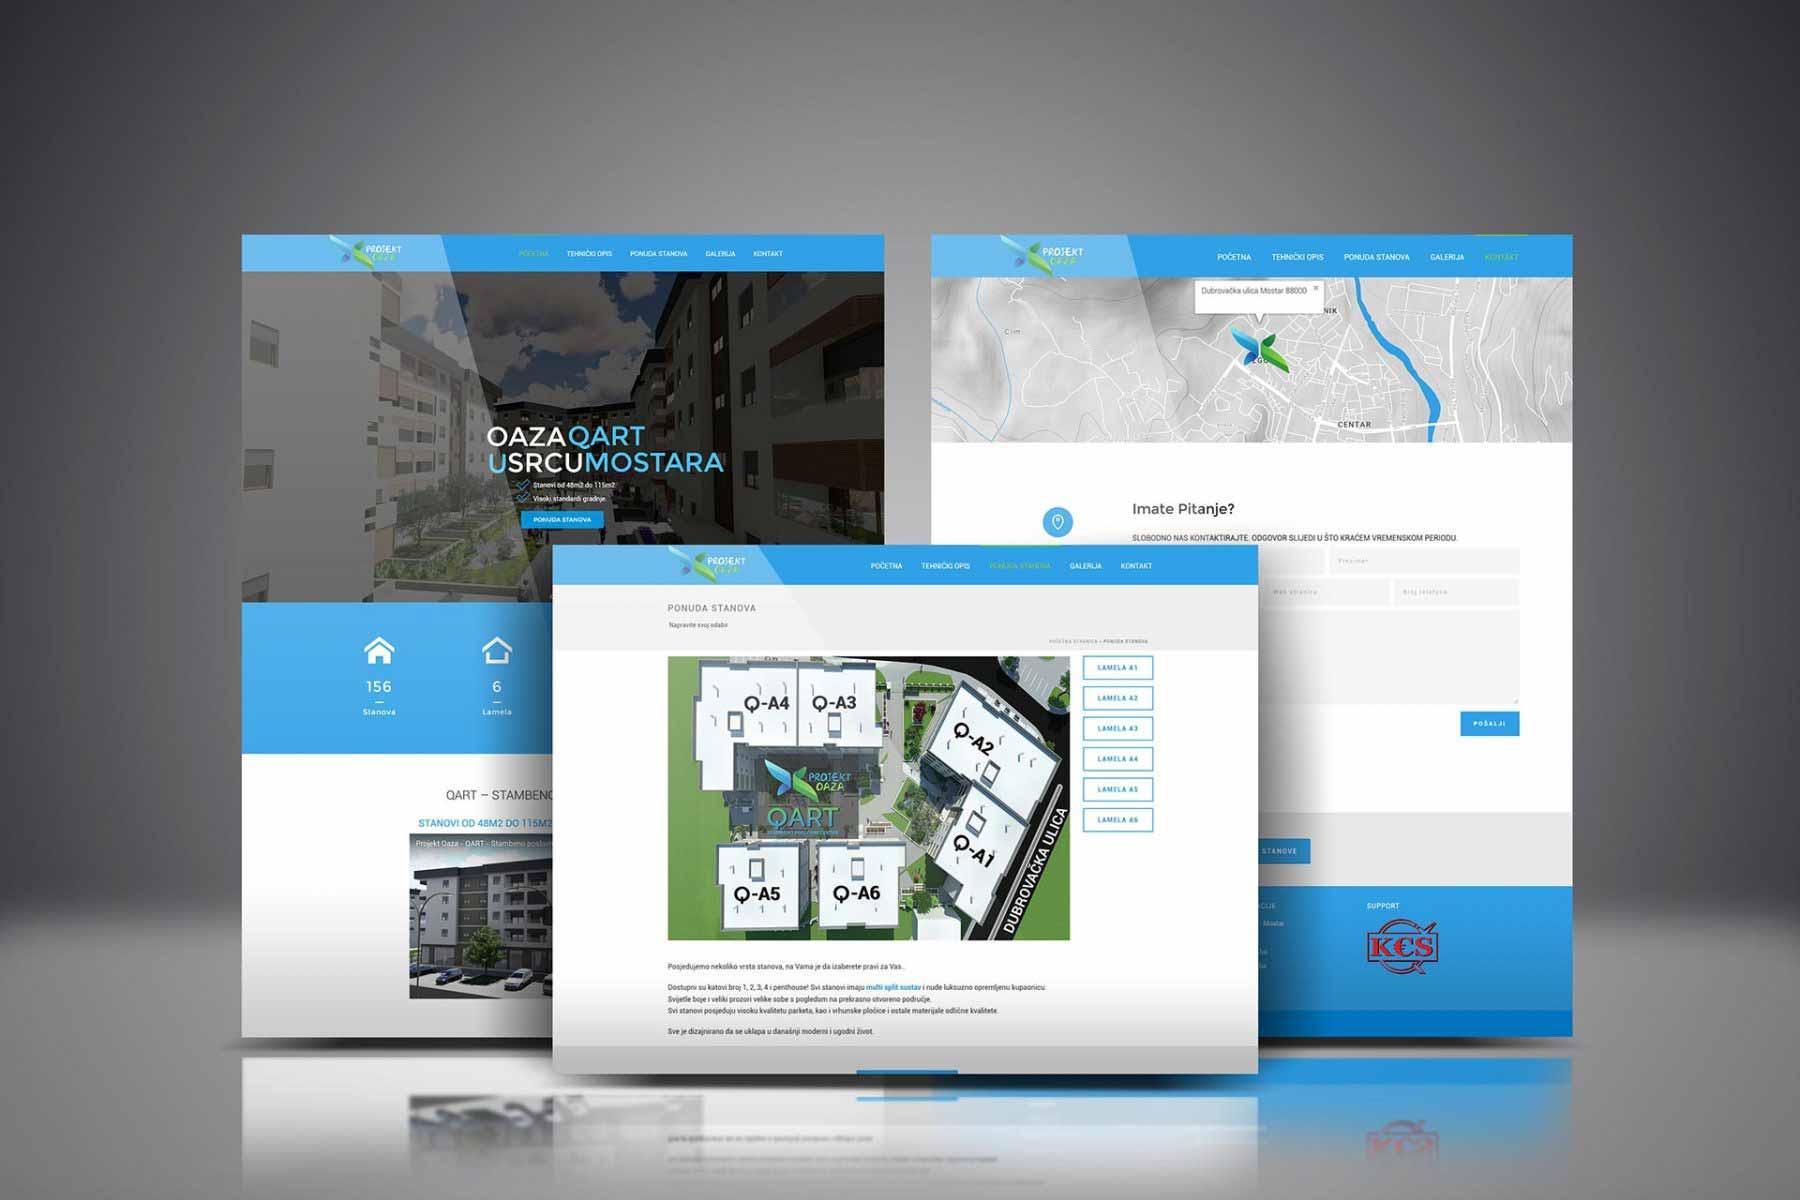 projekt oaza mostar web design e-inzenjering